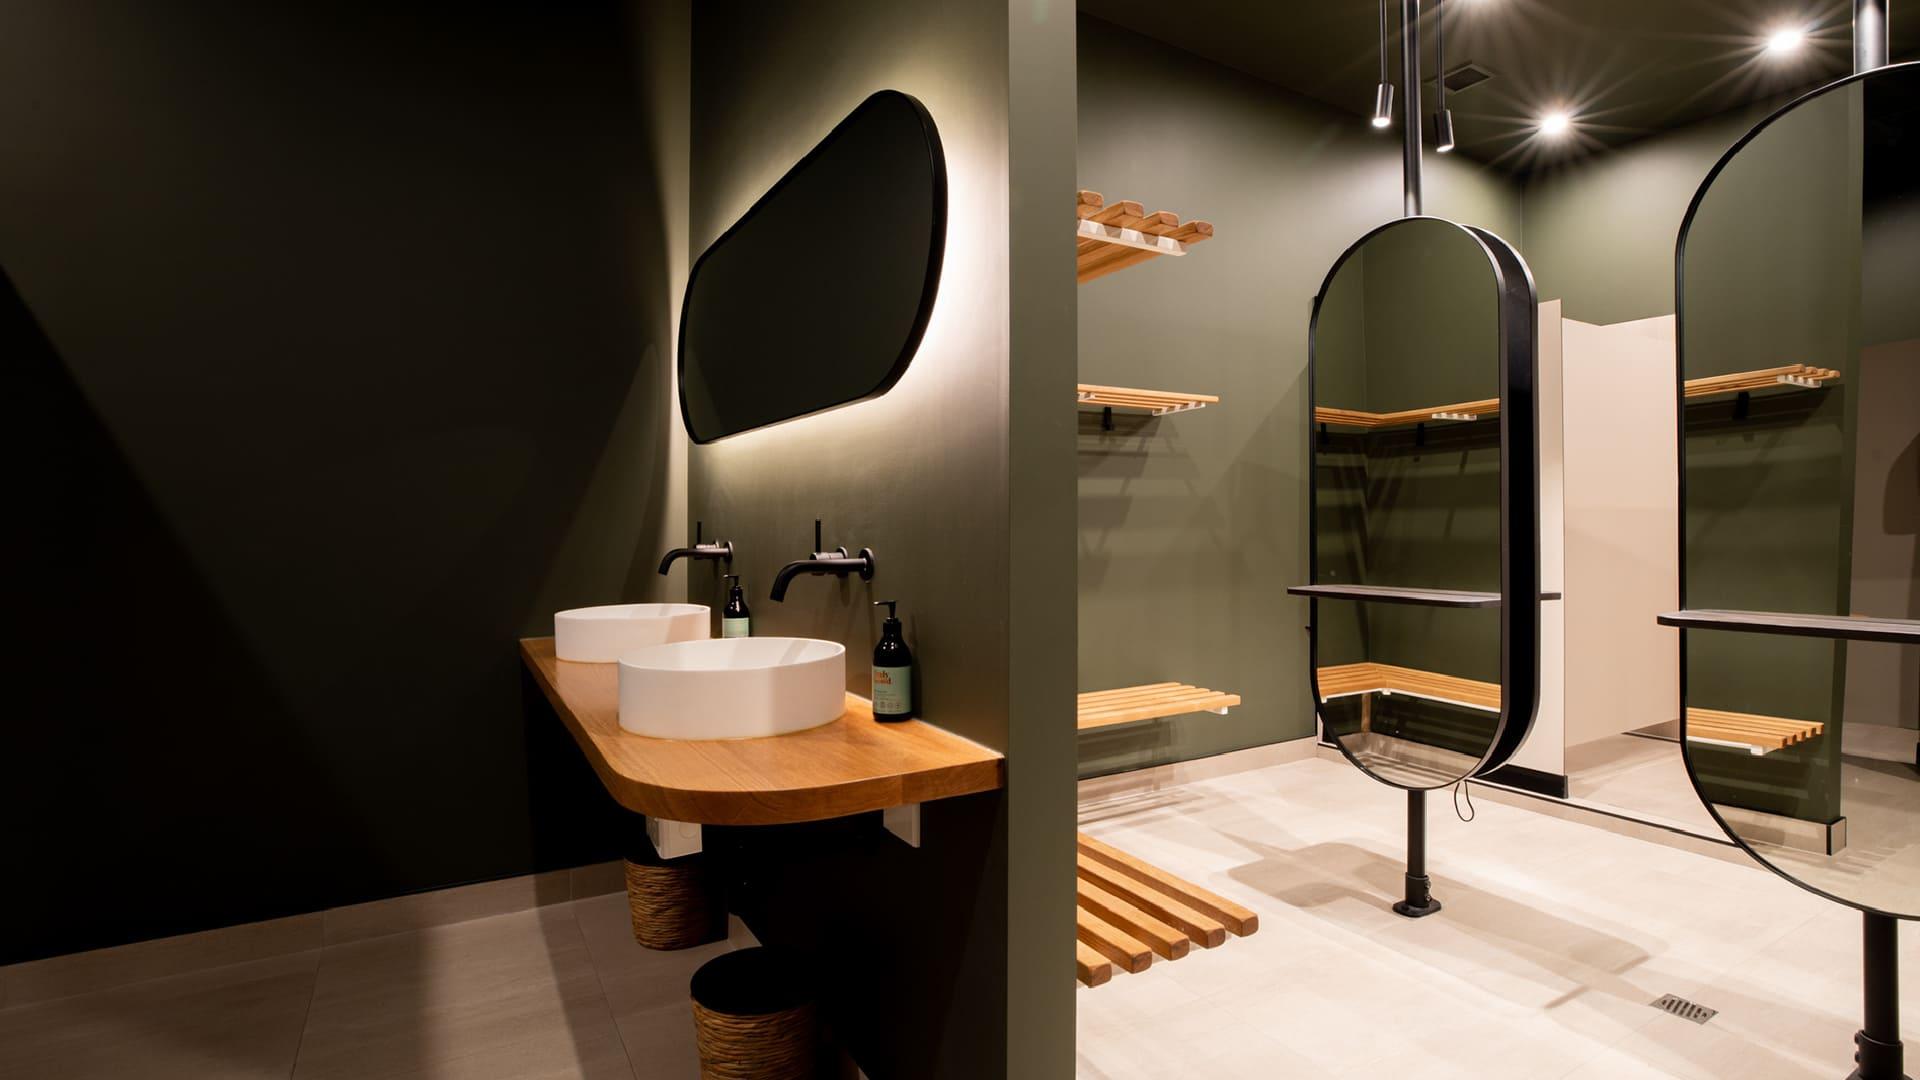 attraction studio o-studio brand interior bathroom